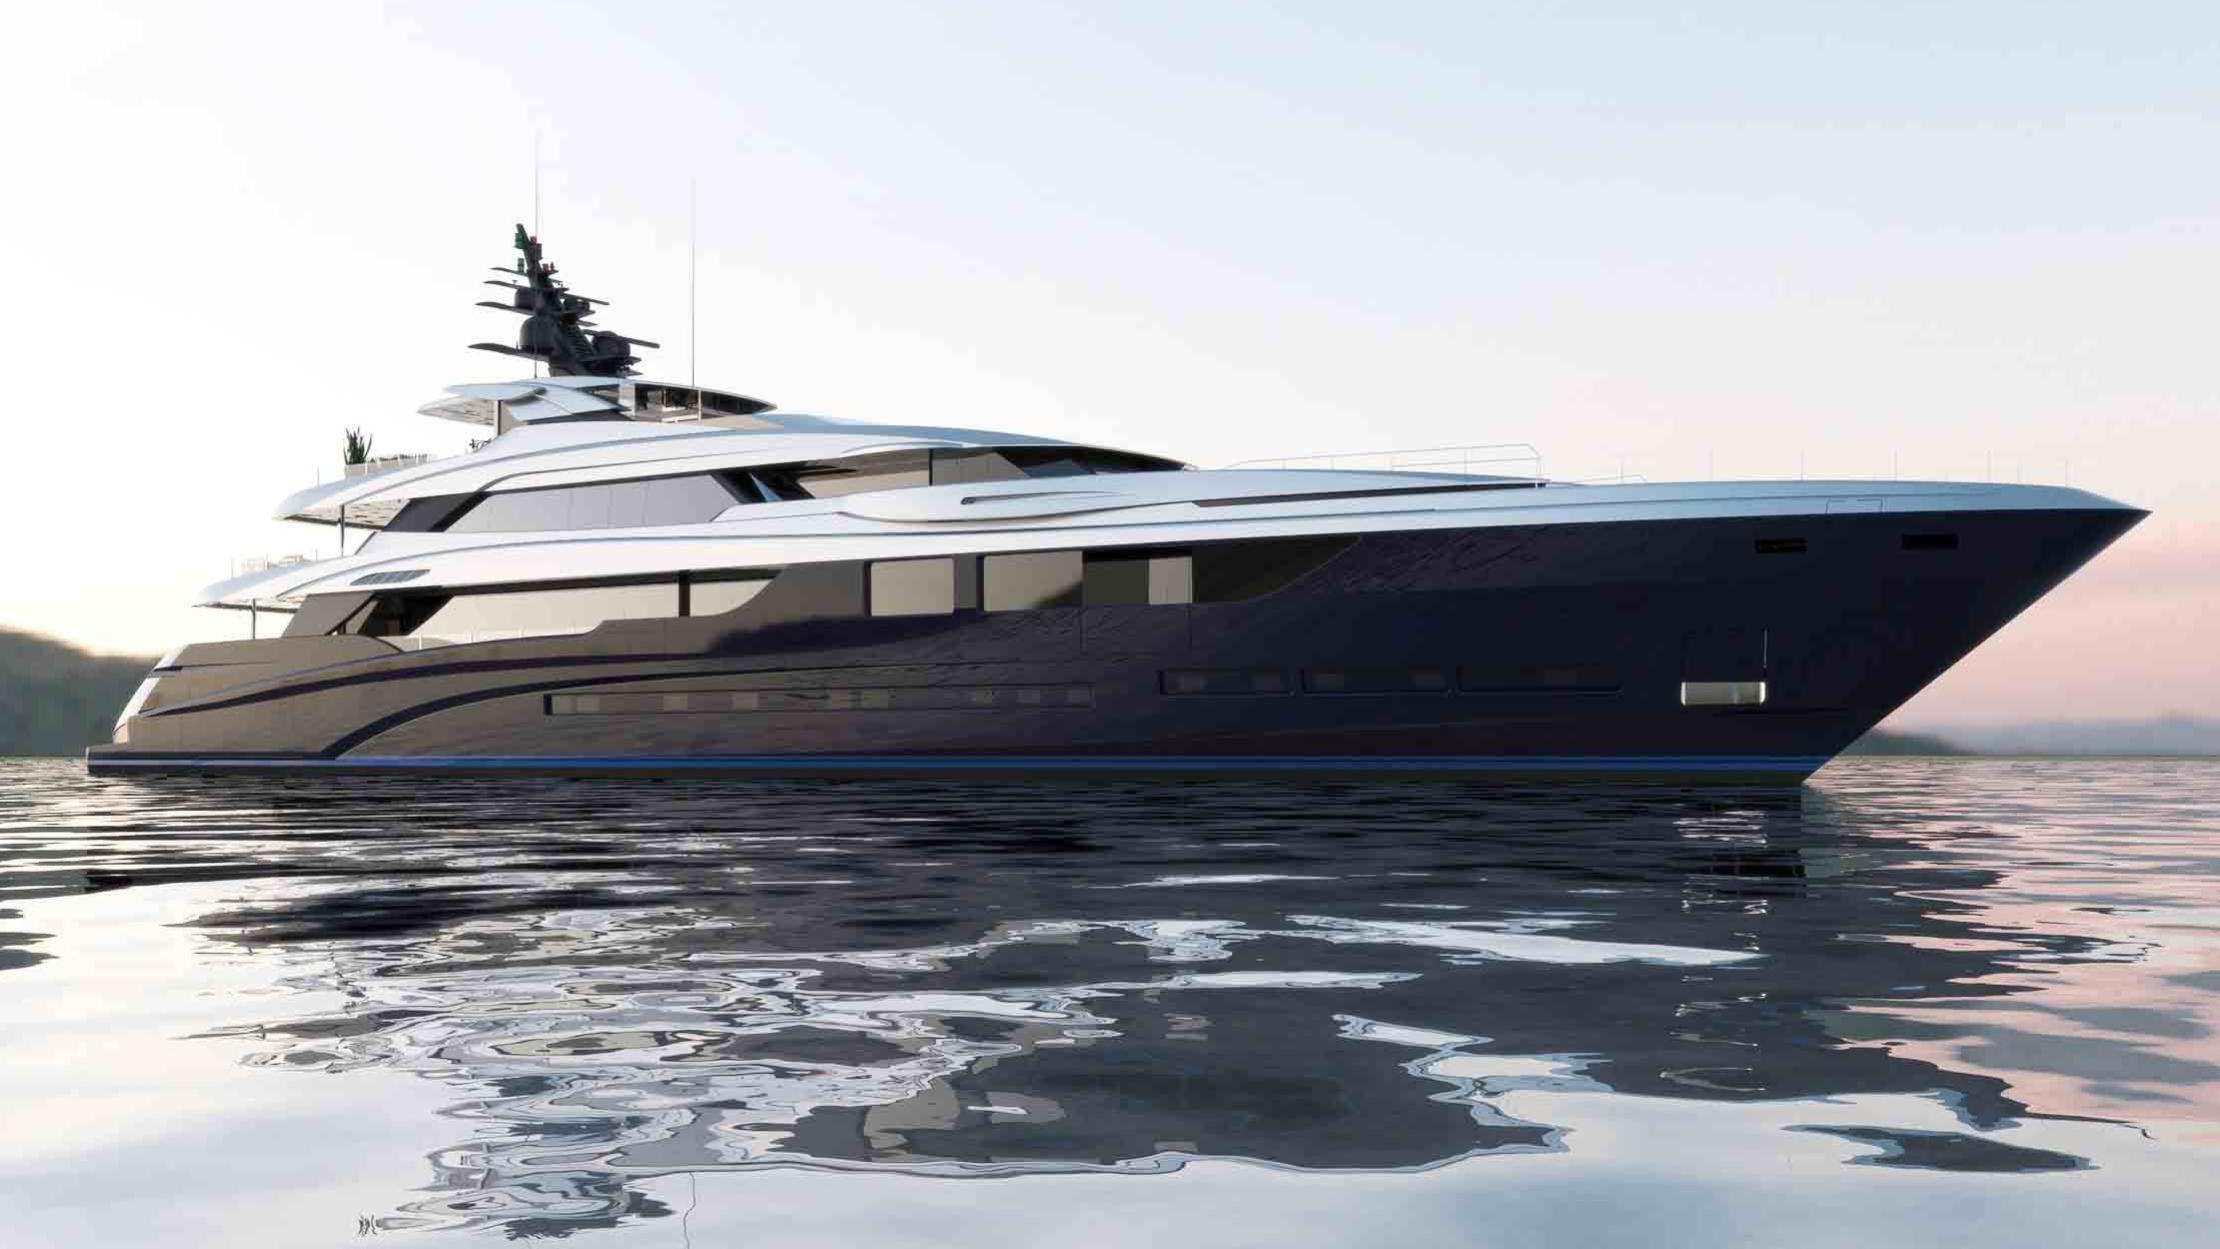 sarastar motoryacht mondomarine 2016 60m rendering